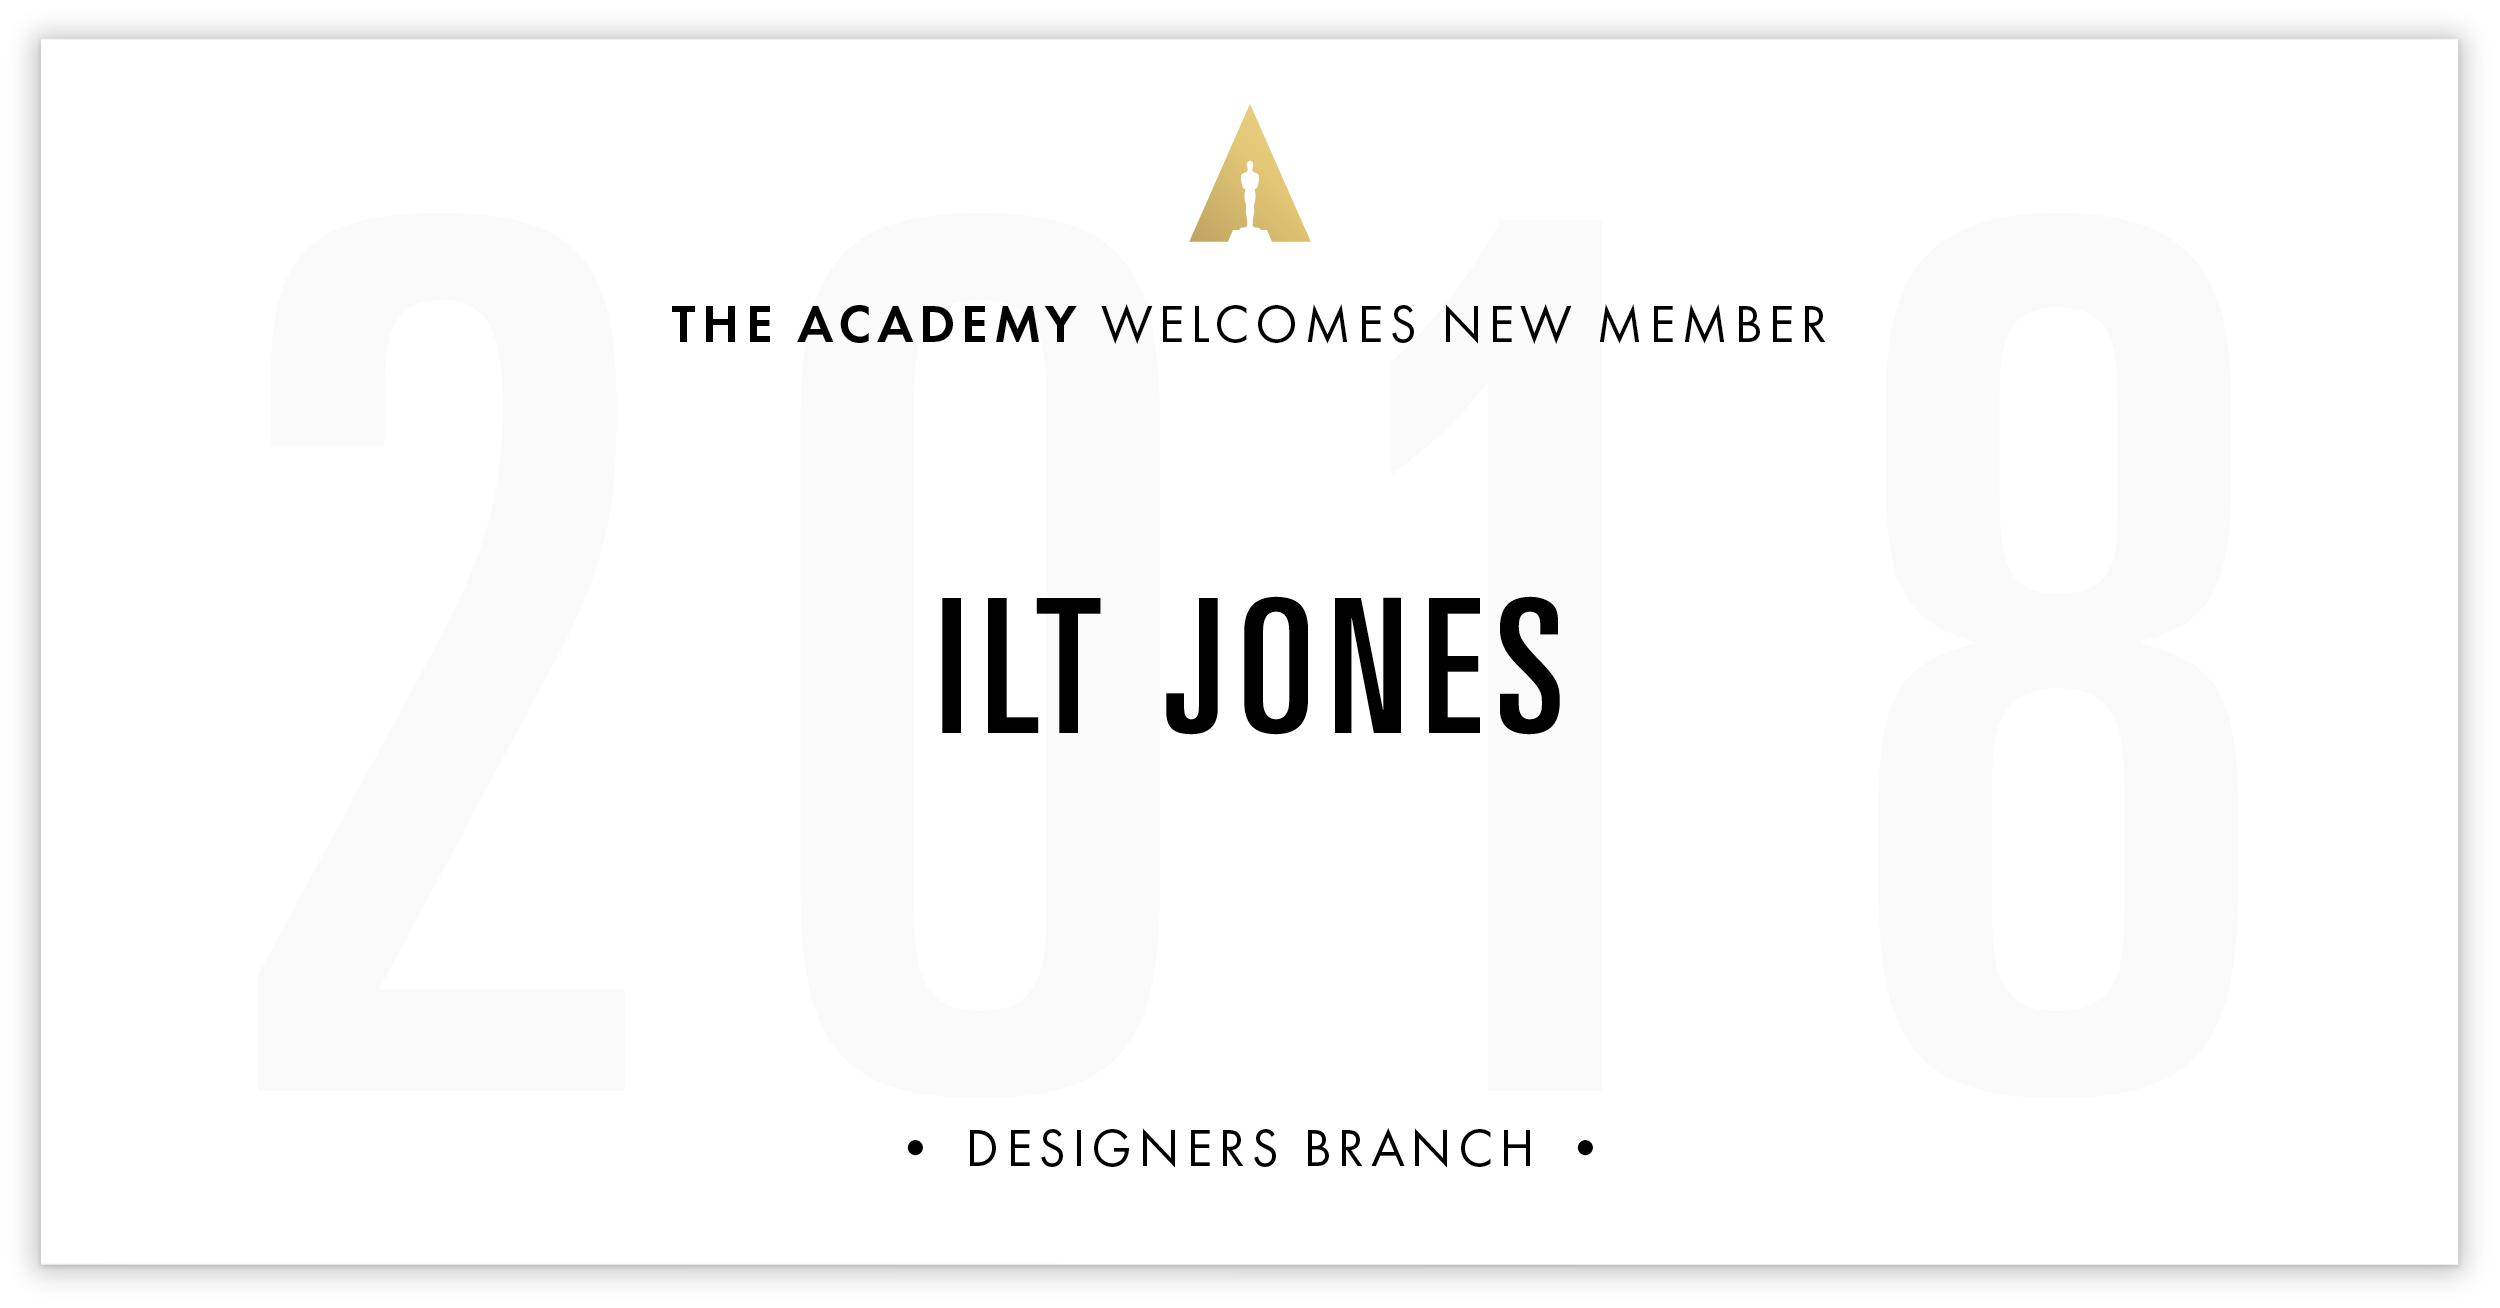 Ilt Jones is invited!